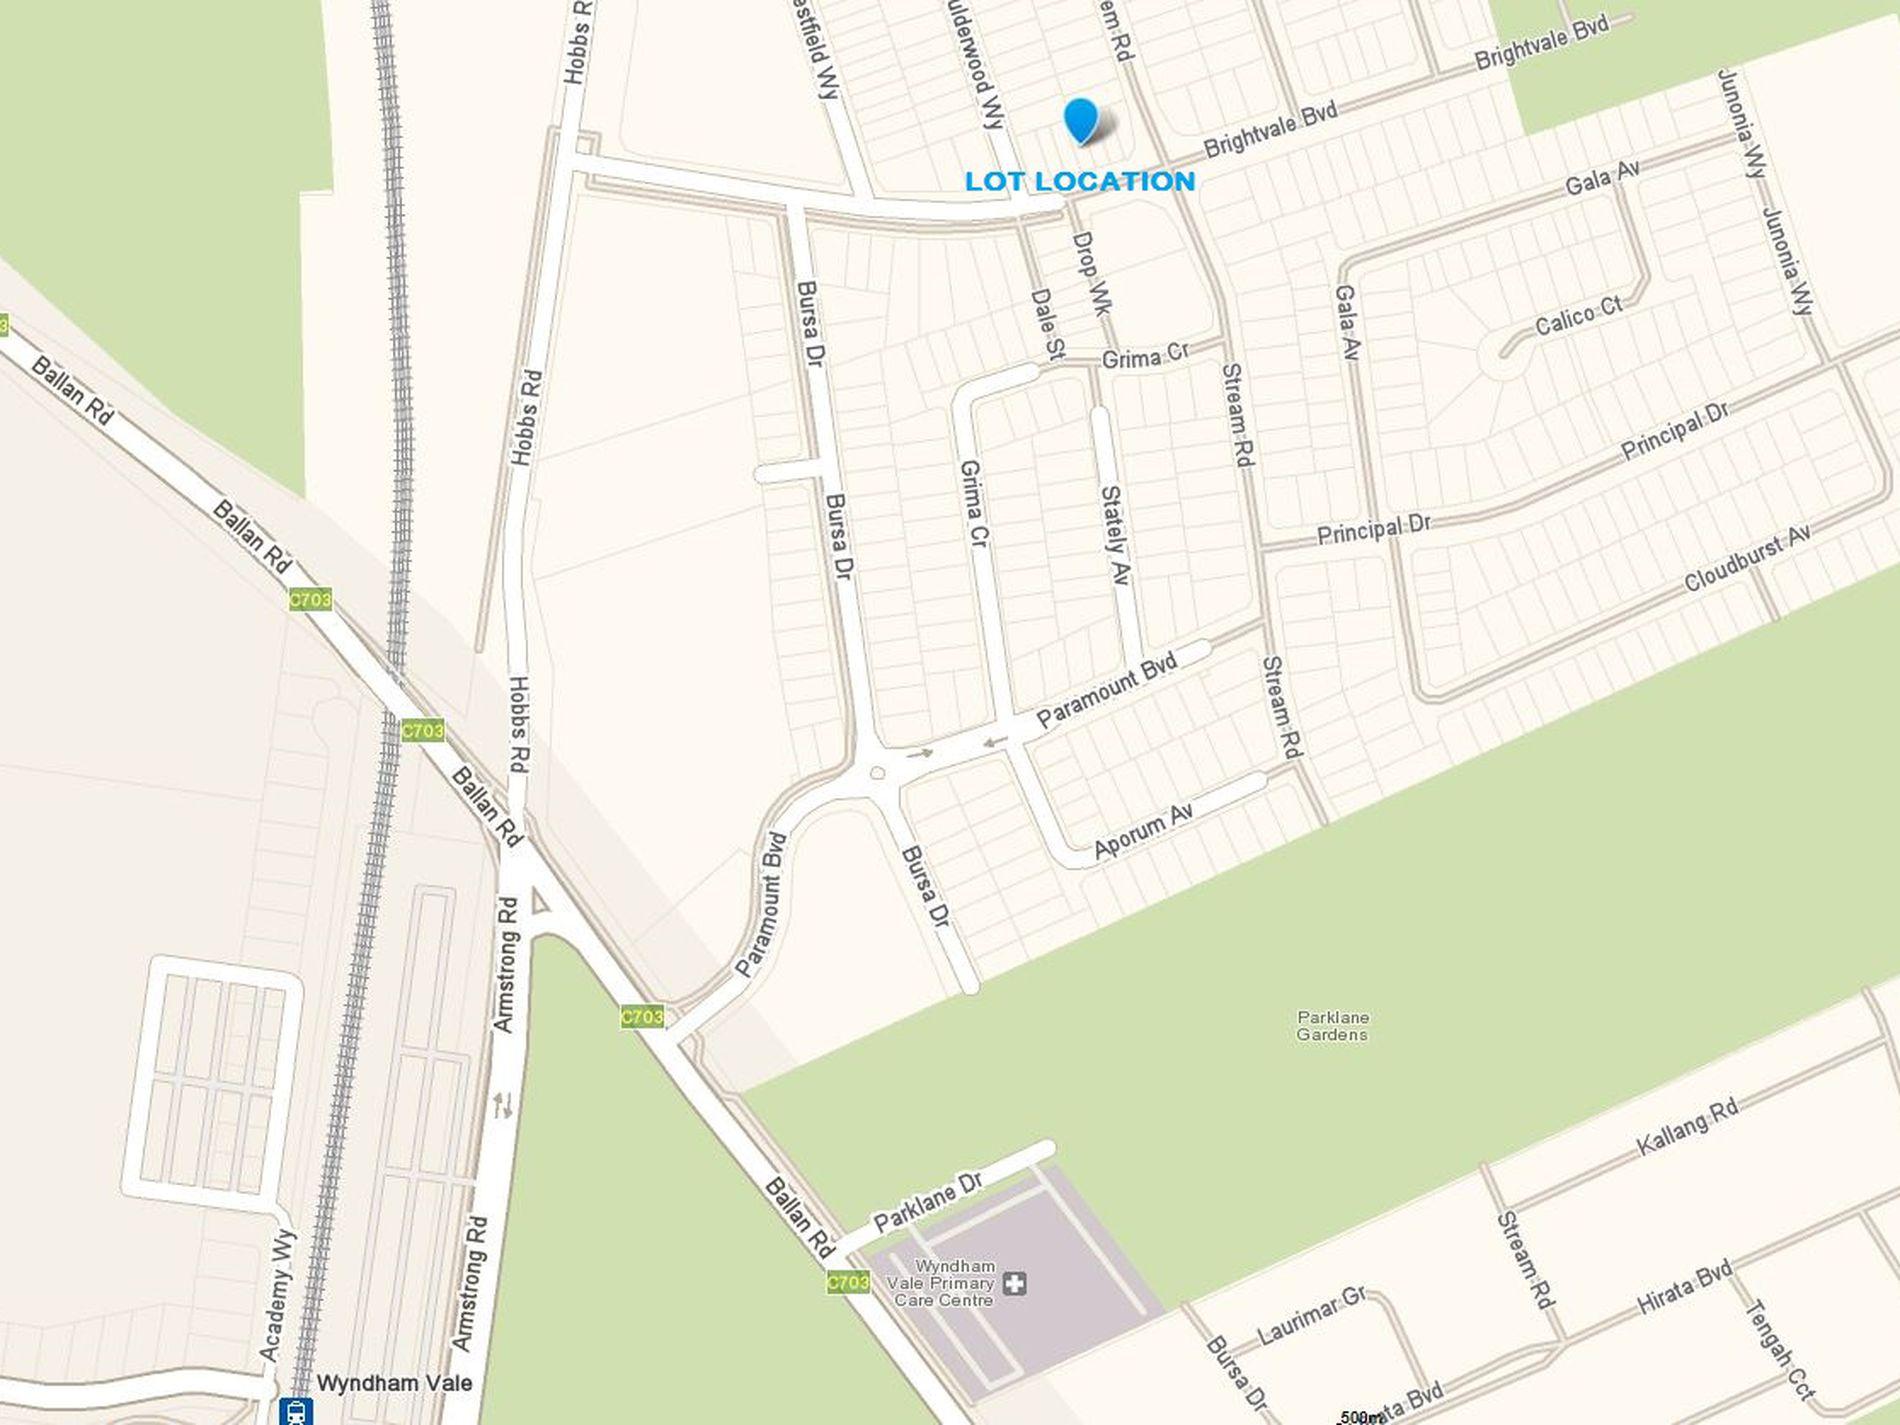 33 Brightvale Boulevard, Wyndham Vale